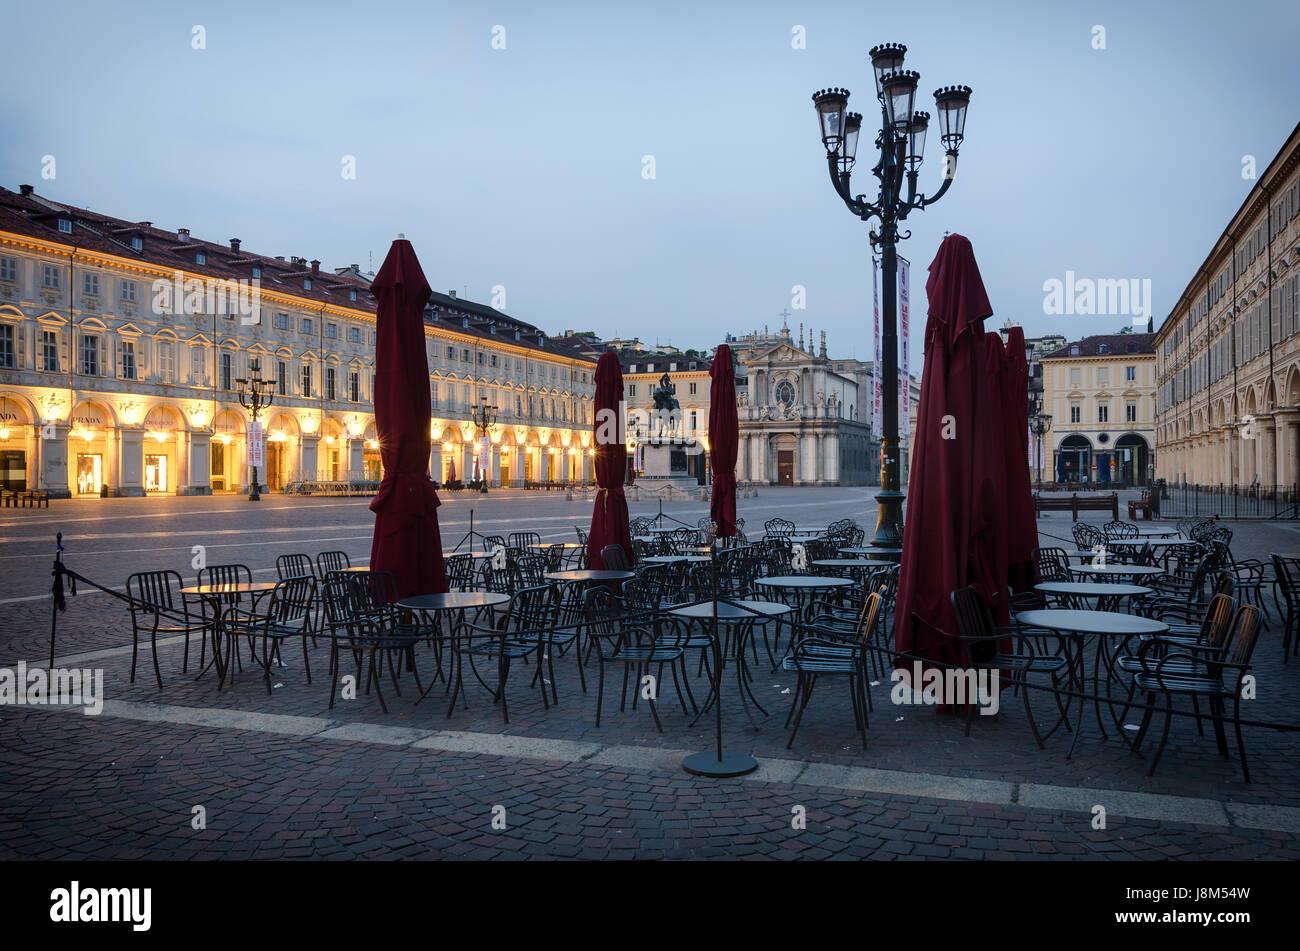 Piazza San Carlo de Turín en penumbra Foto de stock